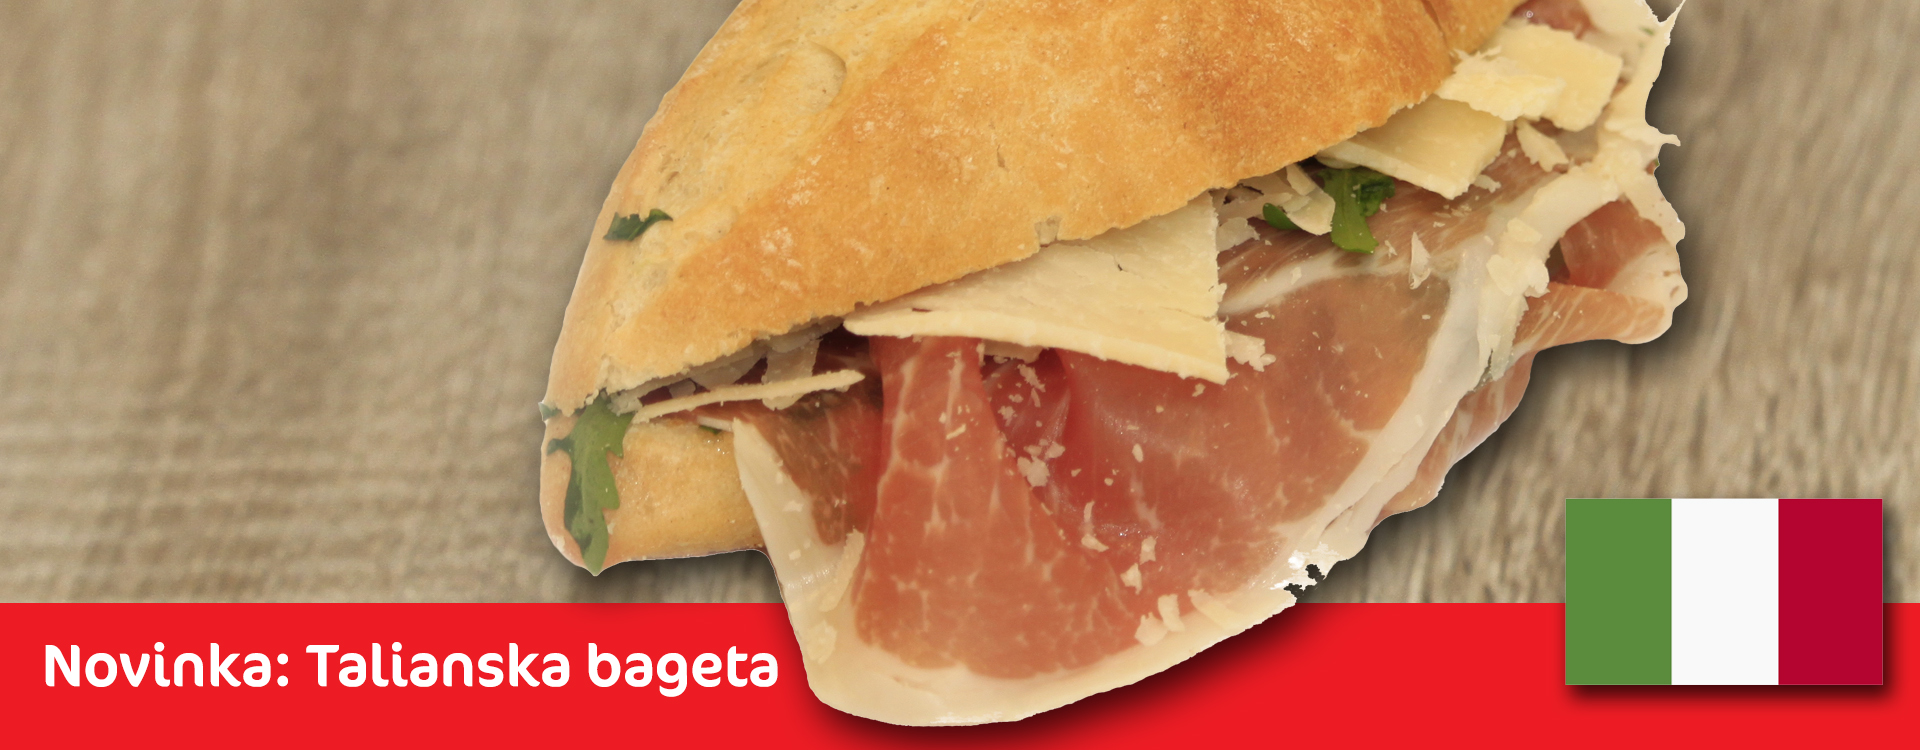 talianska-bageta